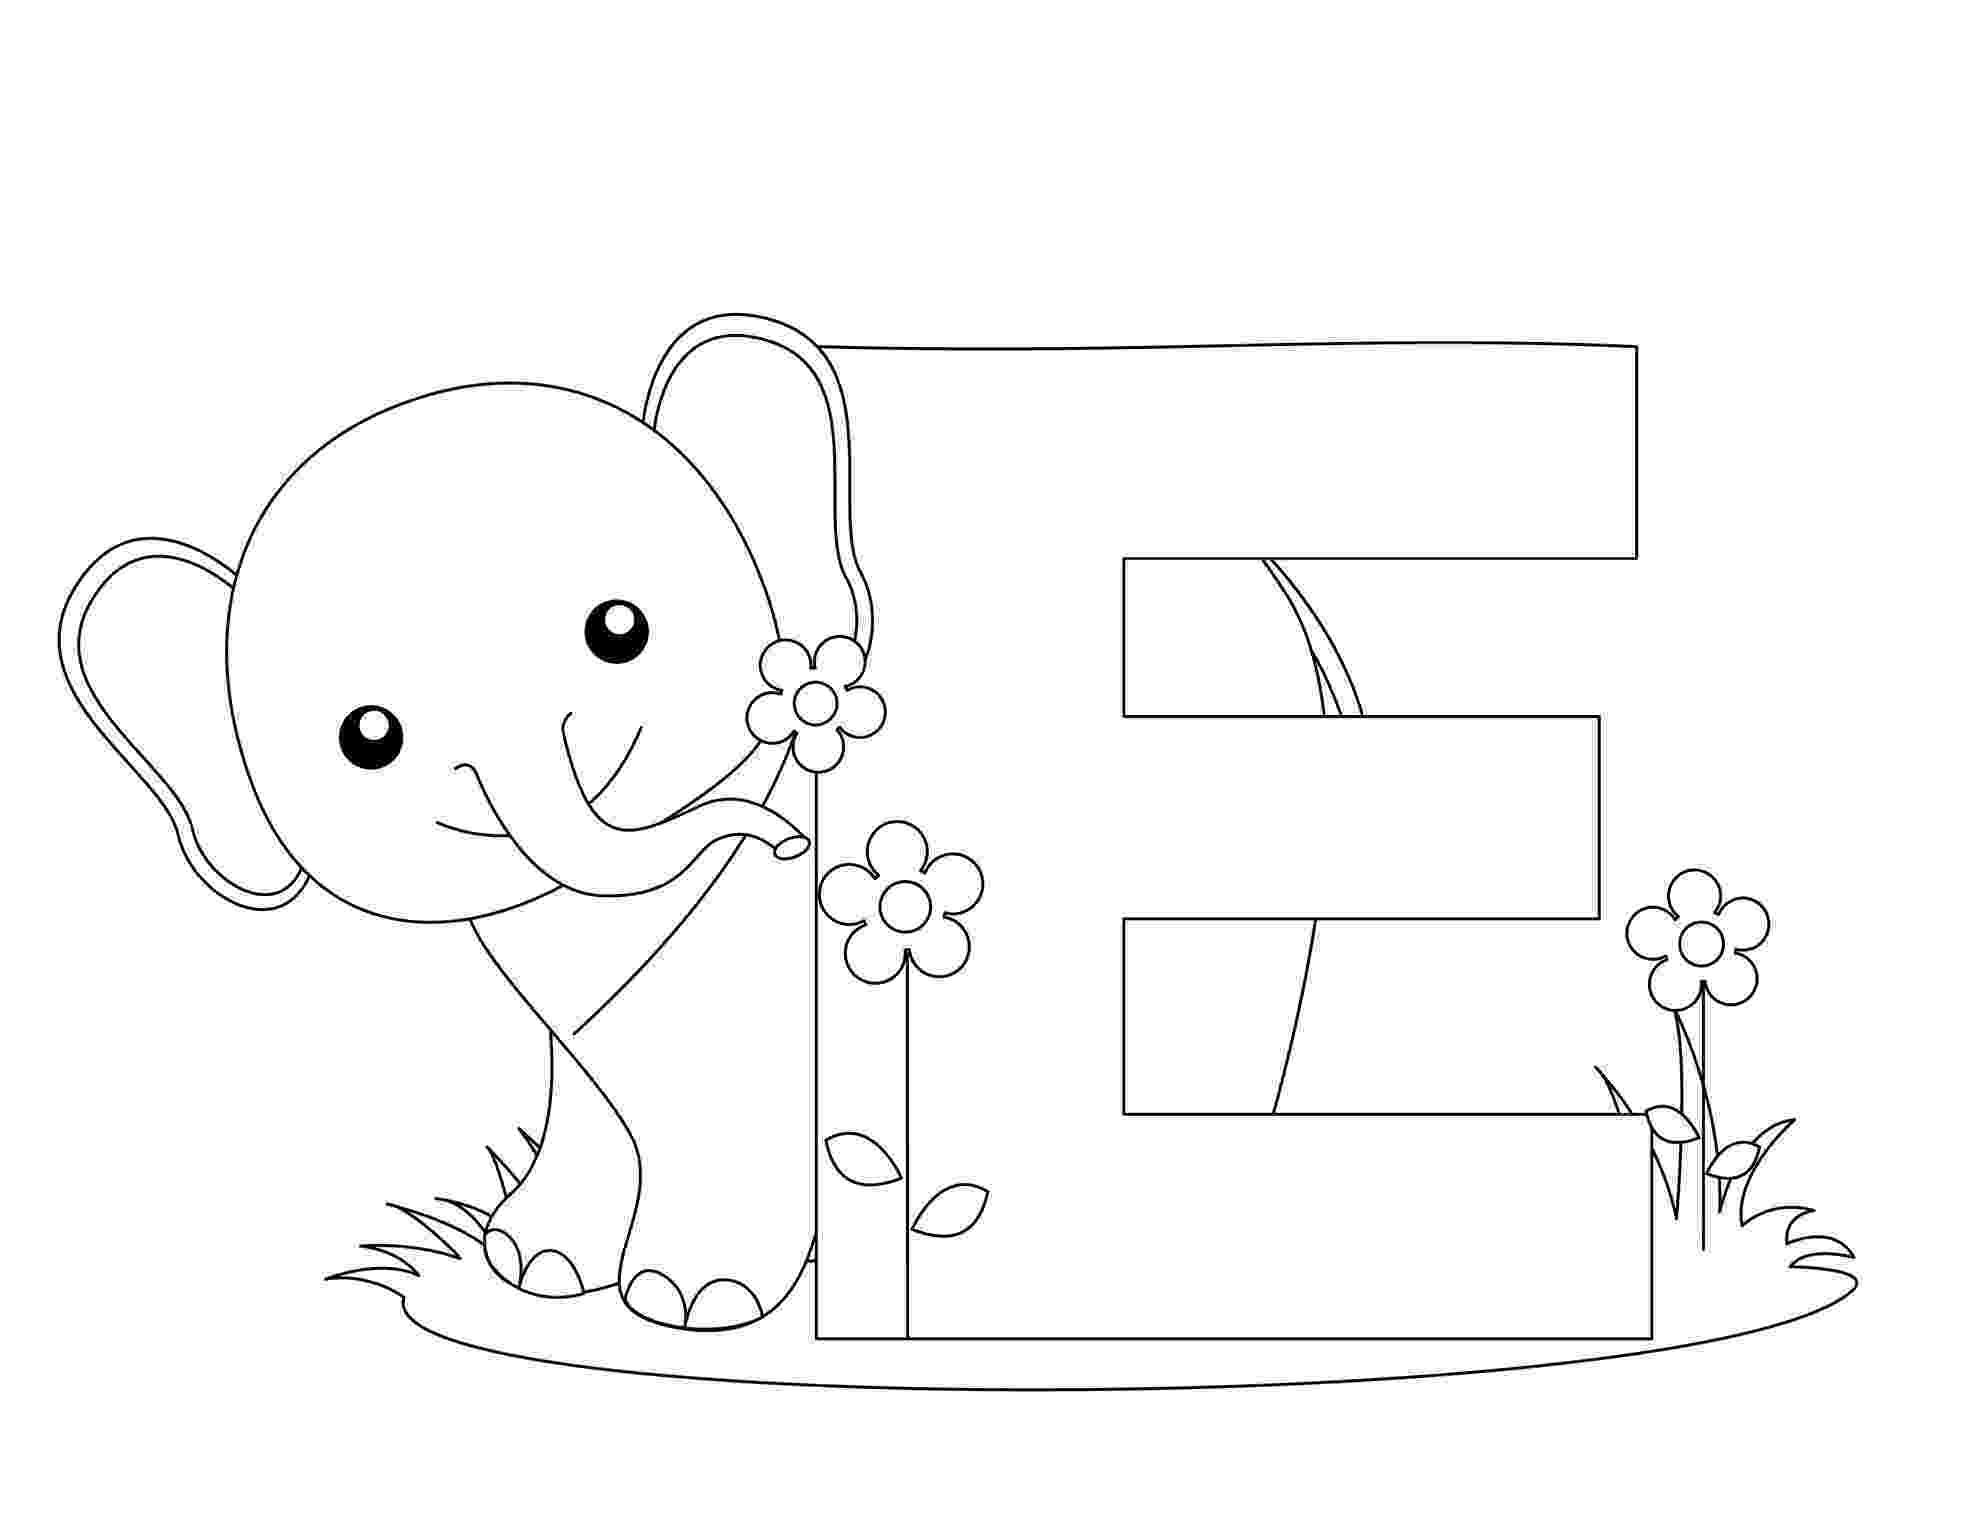 alphabet coloring worksheets free printable alphabet coloring pages for kids best coloring alphabet worksheets